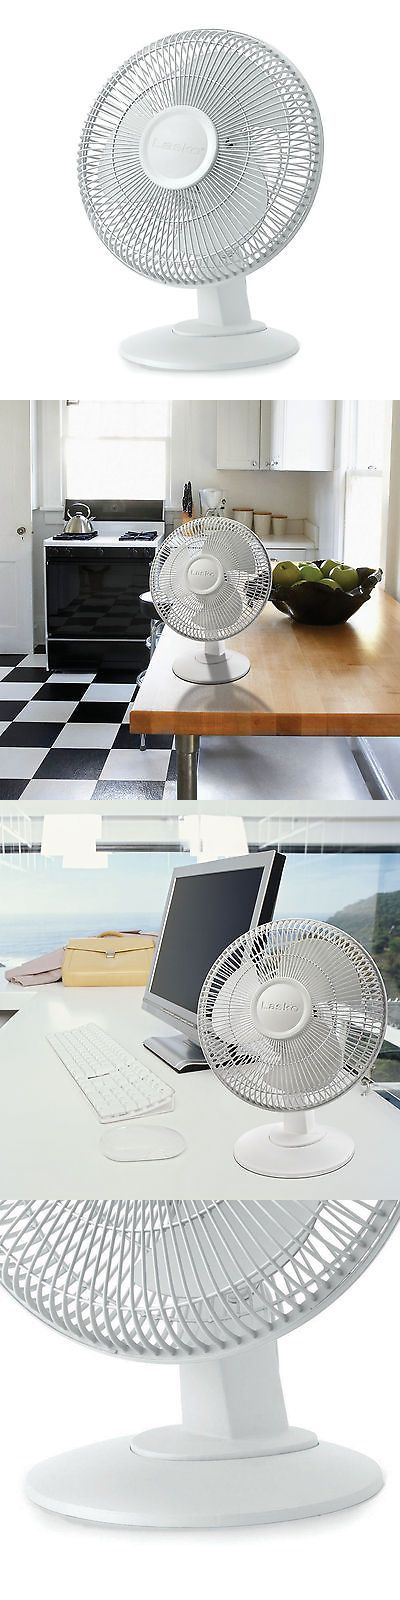 Portable Fans 20612: Lasko 12 Inch 3-Speed Ultra Quiet Oscillating Table Top Desk Fan, White   2012 -> BUY IT NOW ONLY: $33.99 on eBay!